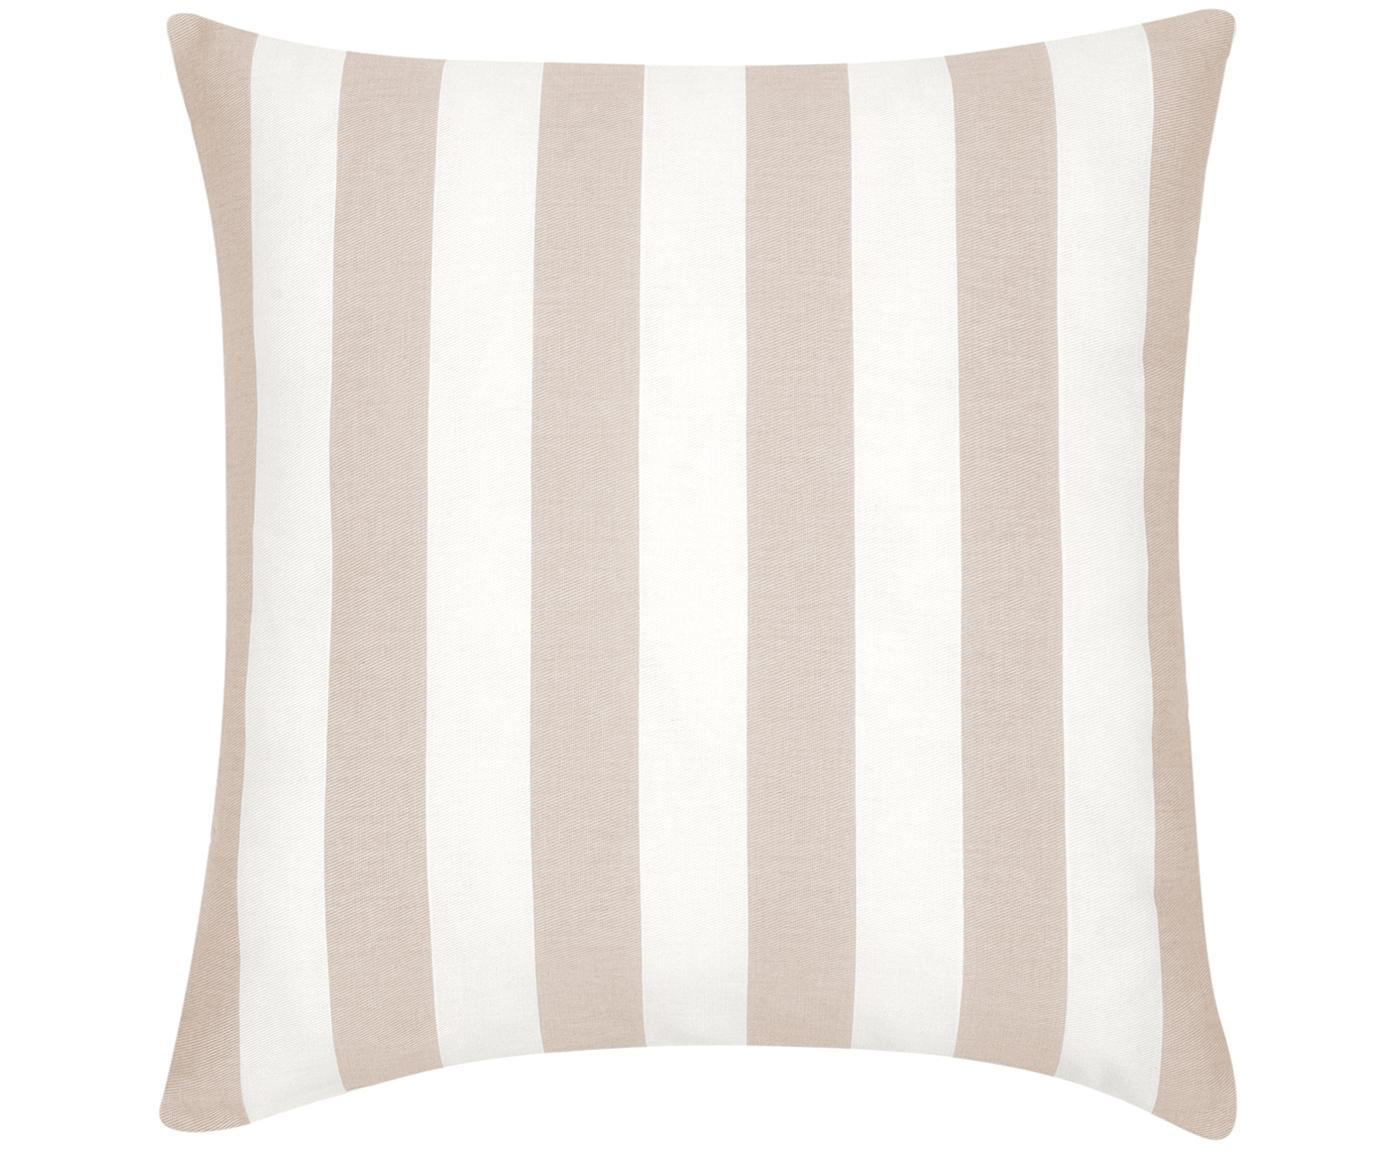 Federa arredo a righe in beige/bianco Timon, Cotone, Taupe, bianco, Larg. 45 x Lung. 45 cm